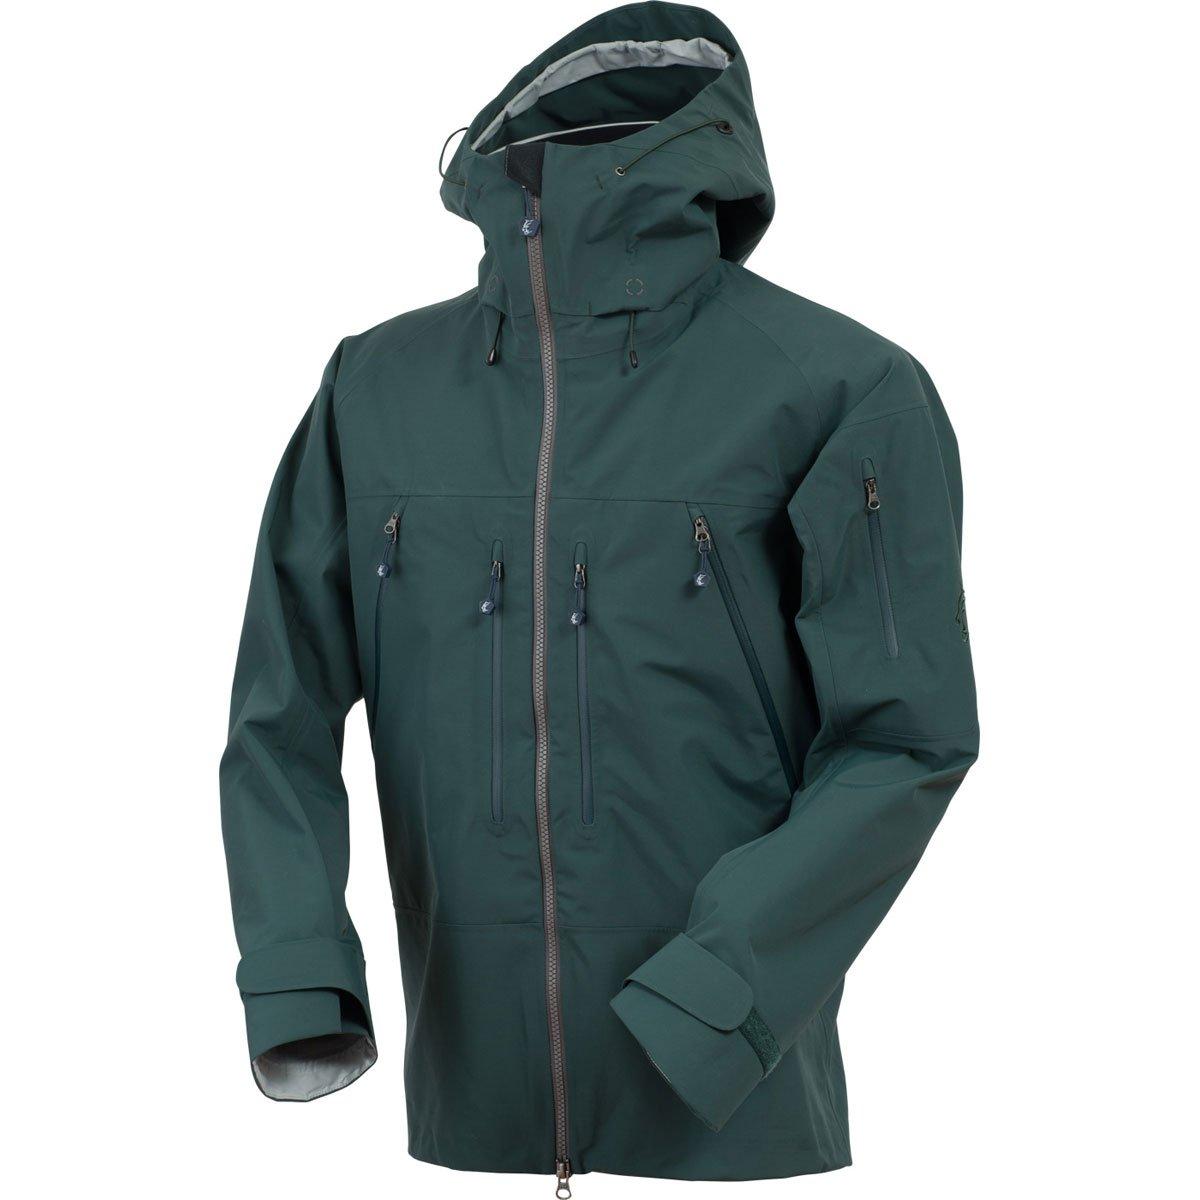 Teton Bros.(ティートンブロス) TBジャケット男性用 17301M B076HGRXS1 M|Deep green Deep green M